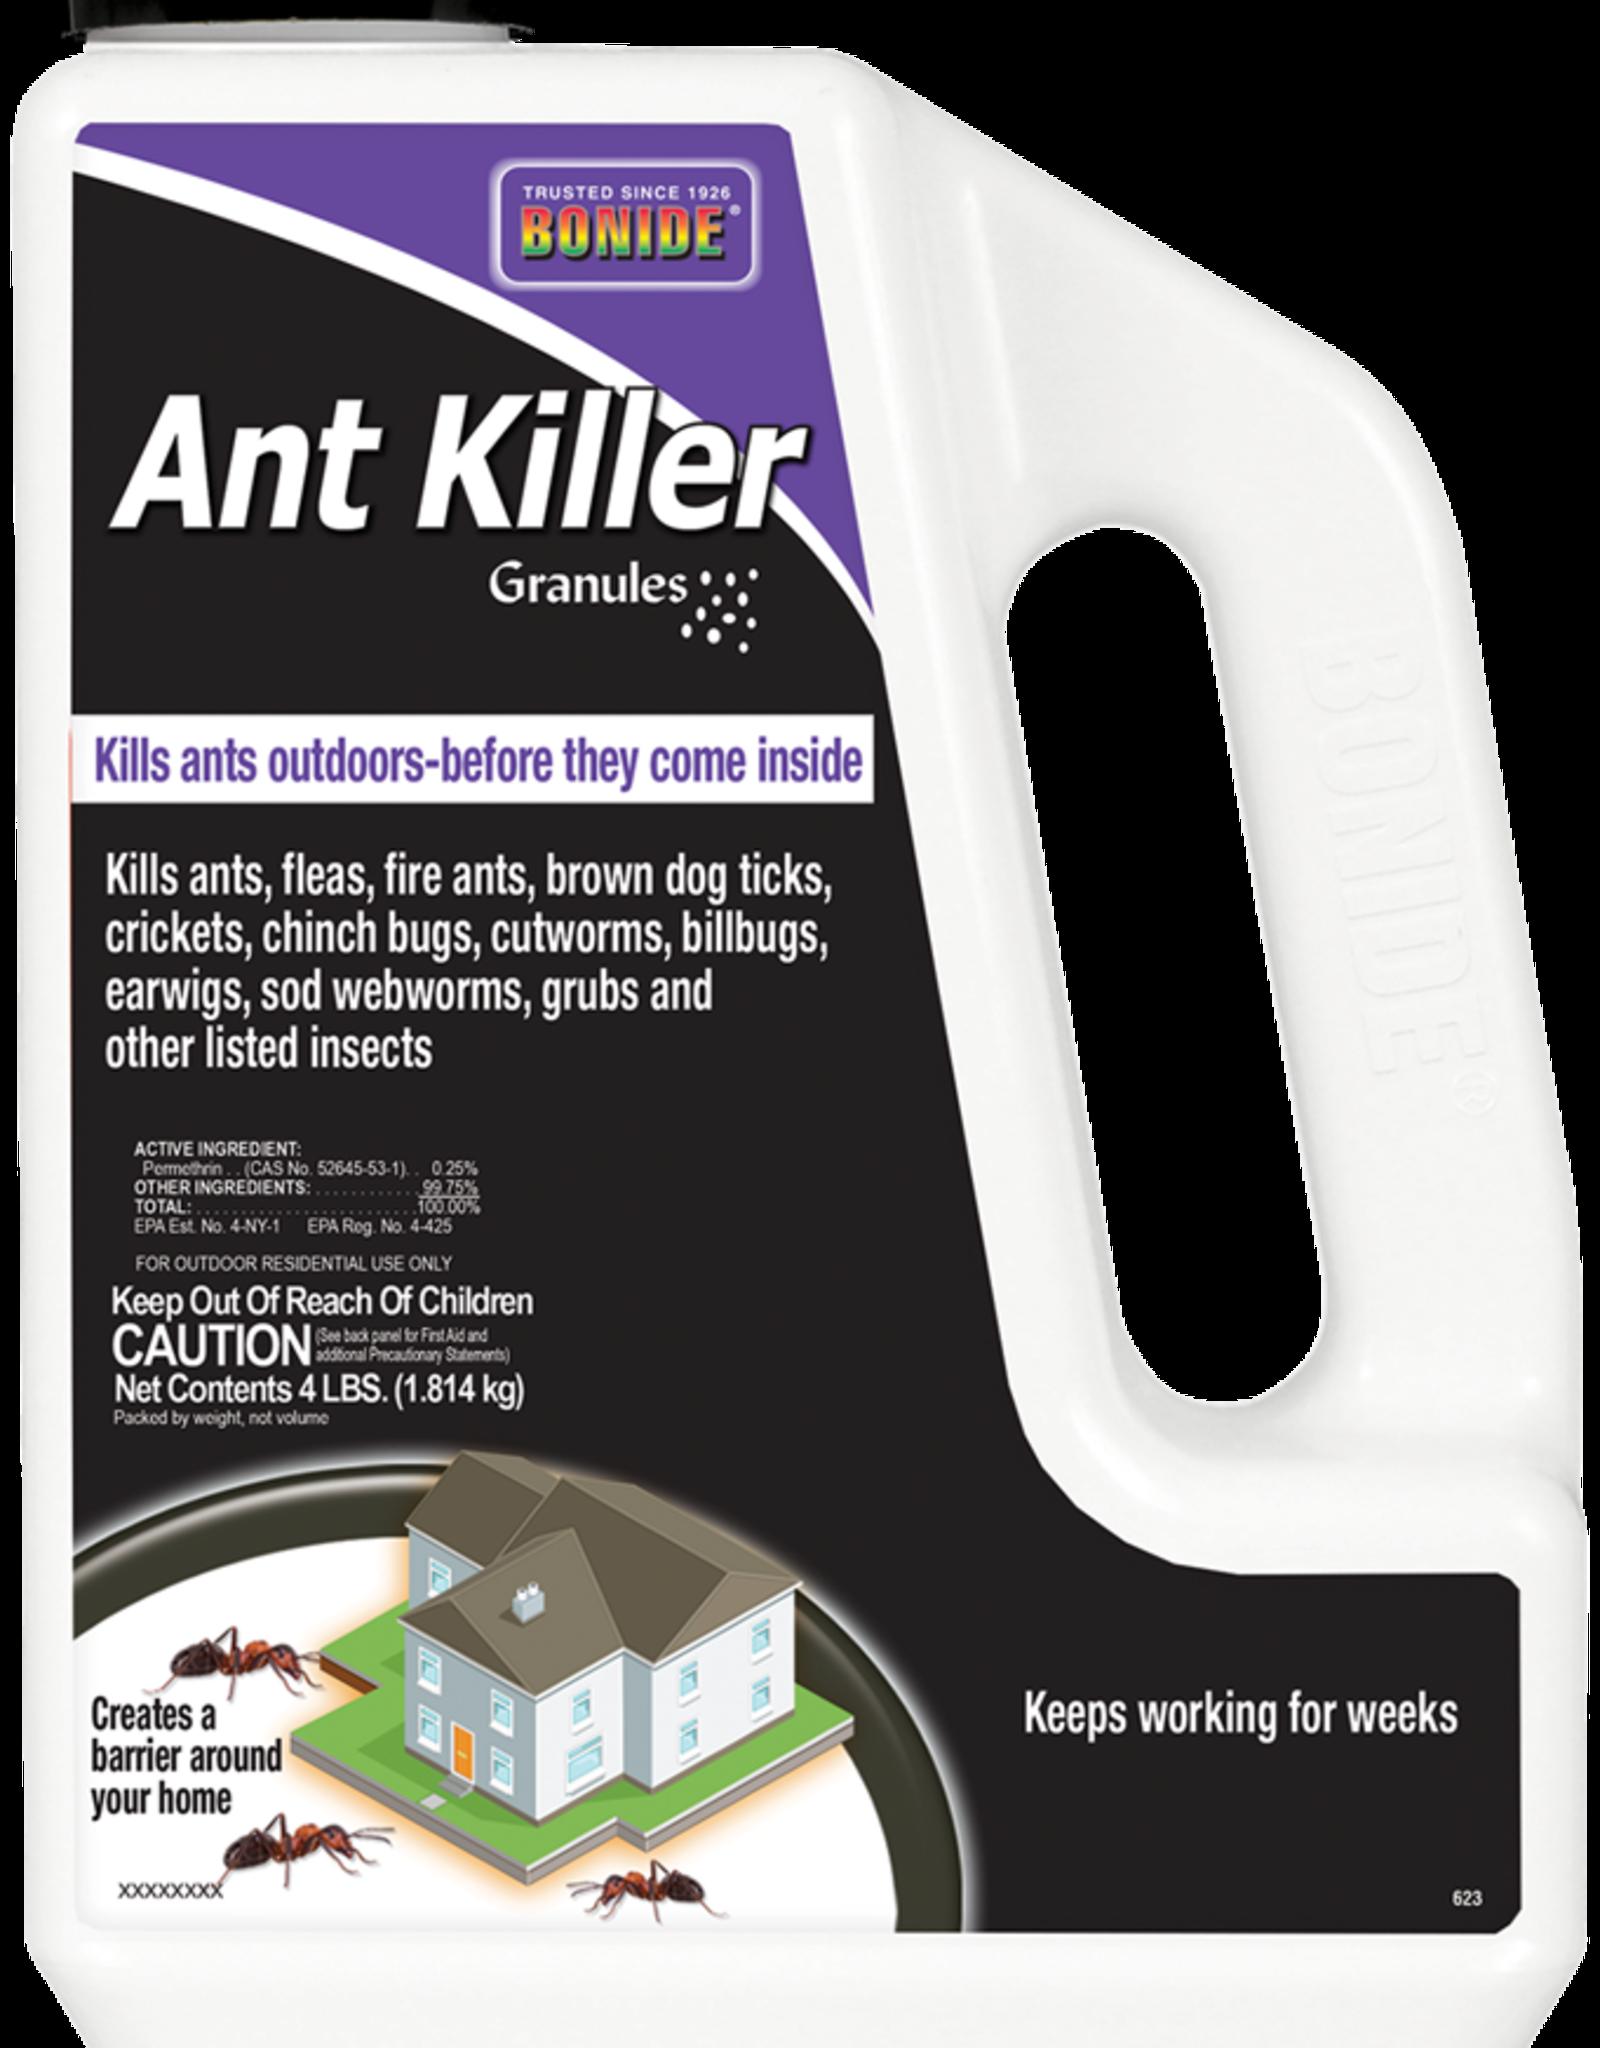 BONIDE PRODUCTS INC     P BONIDE ANT KILLER GRANULES 4LBS